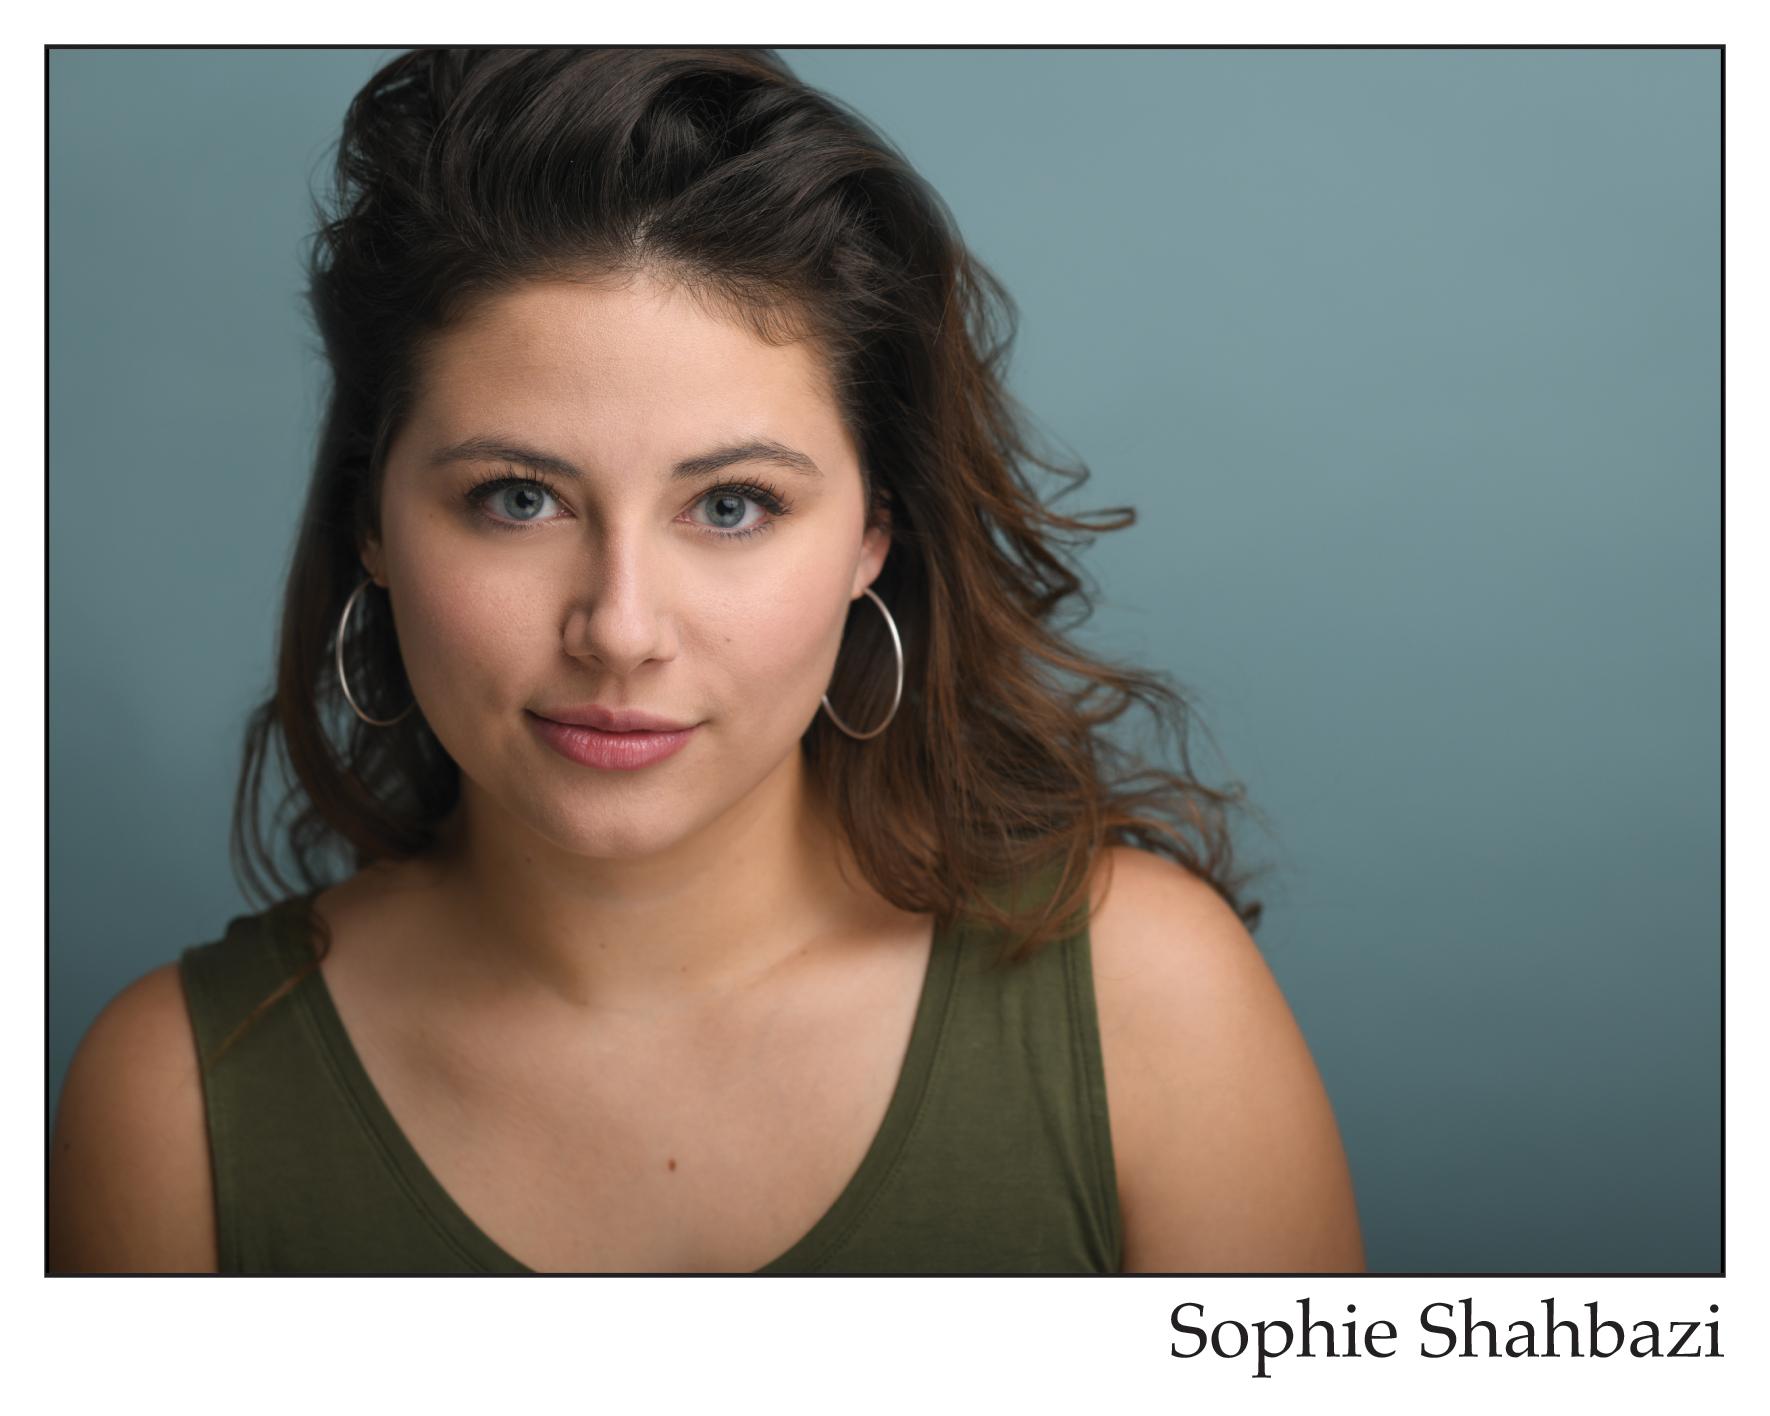 Sophie Shahbazi